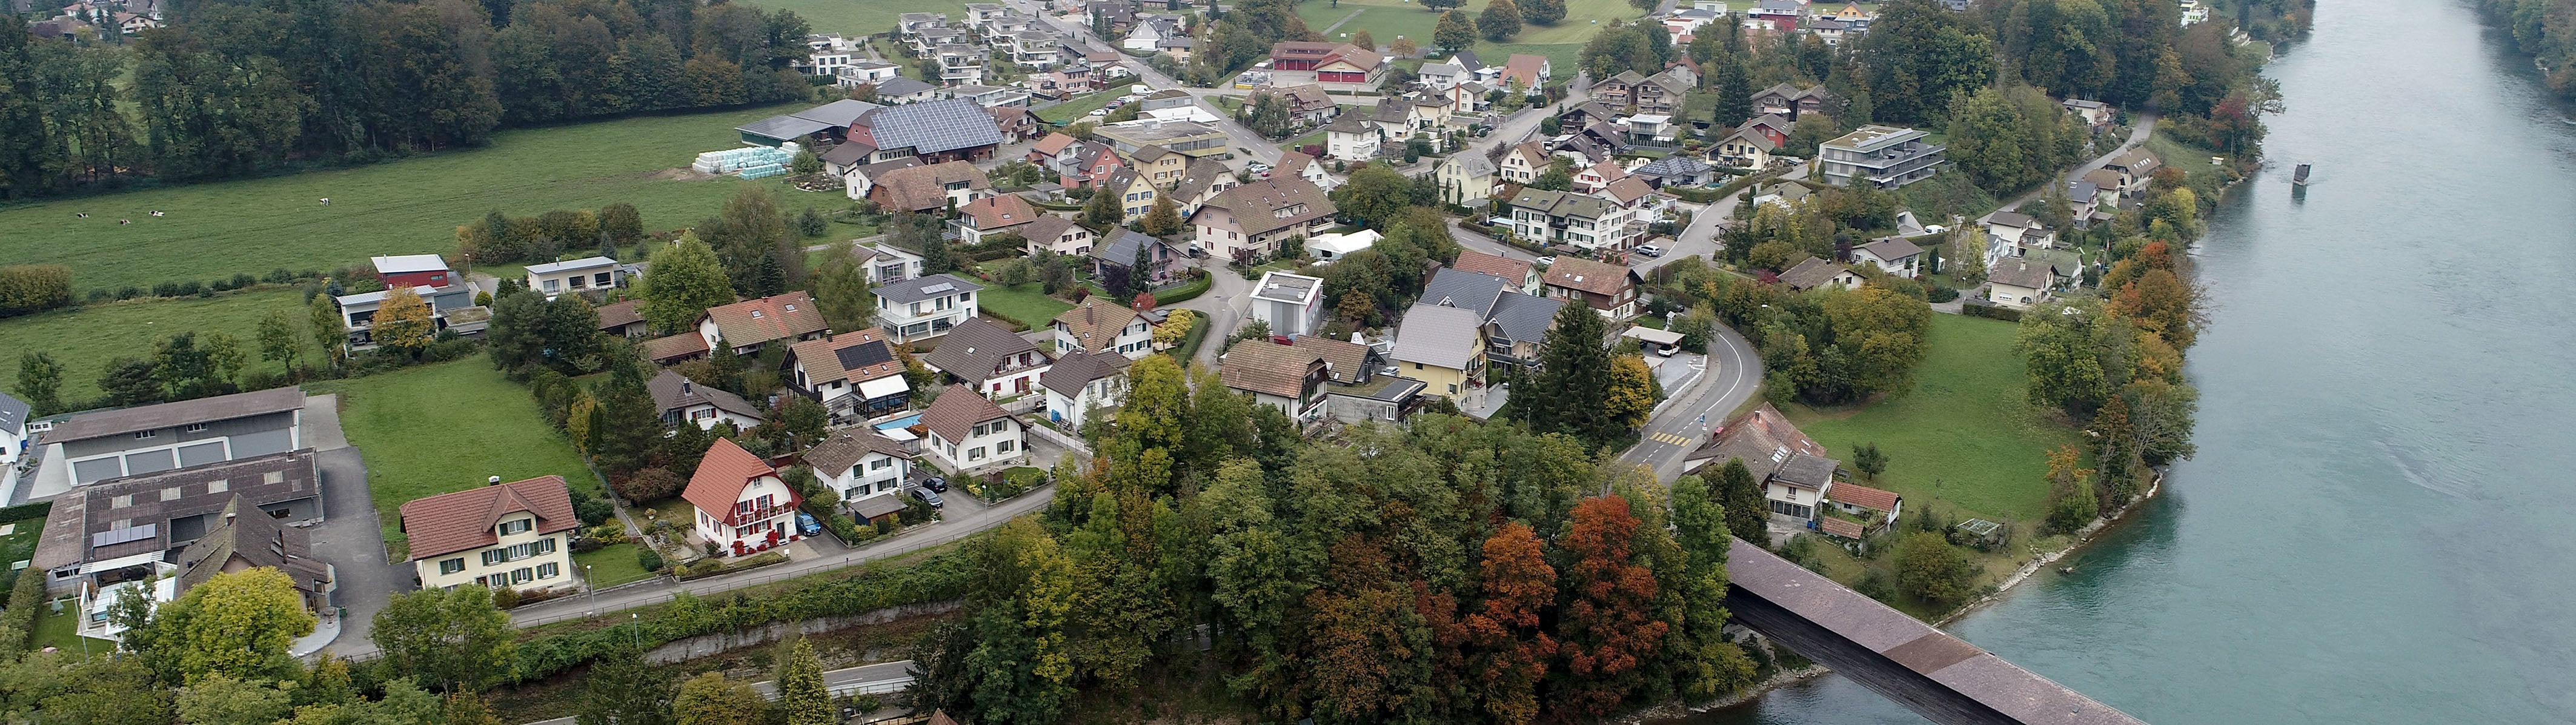 Fulenbach